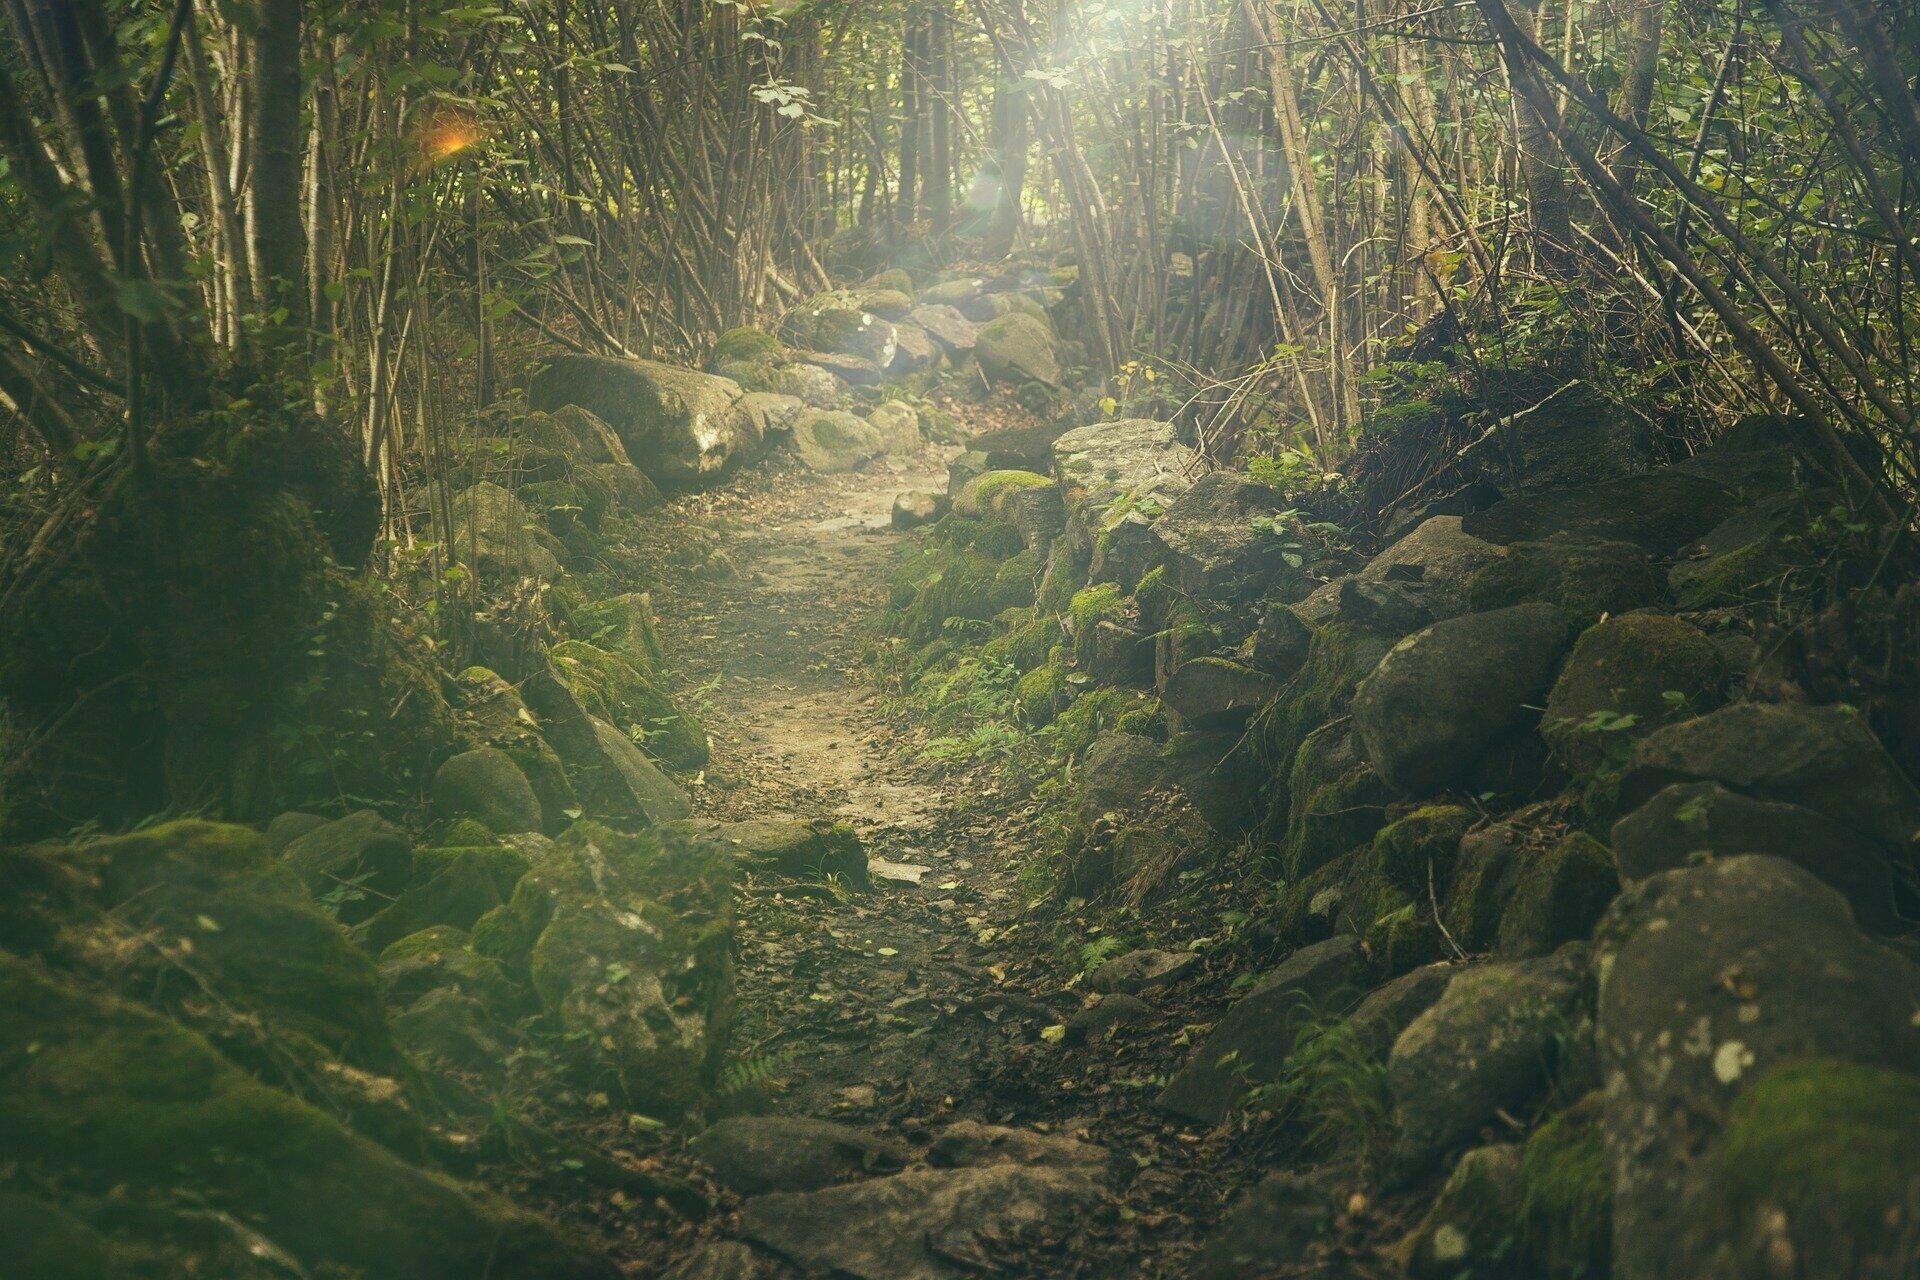 Wald (Symbolbild) - SNA, 1920, 10.09.2021